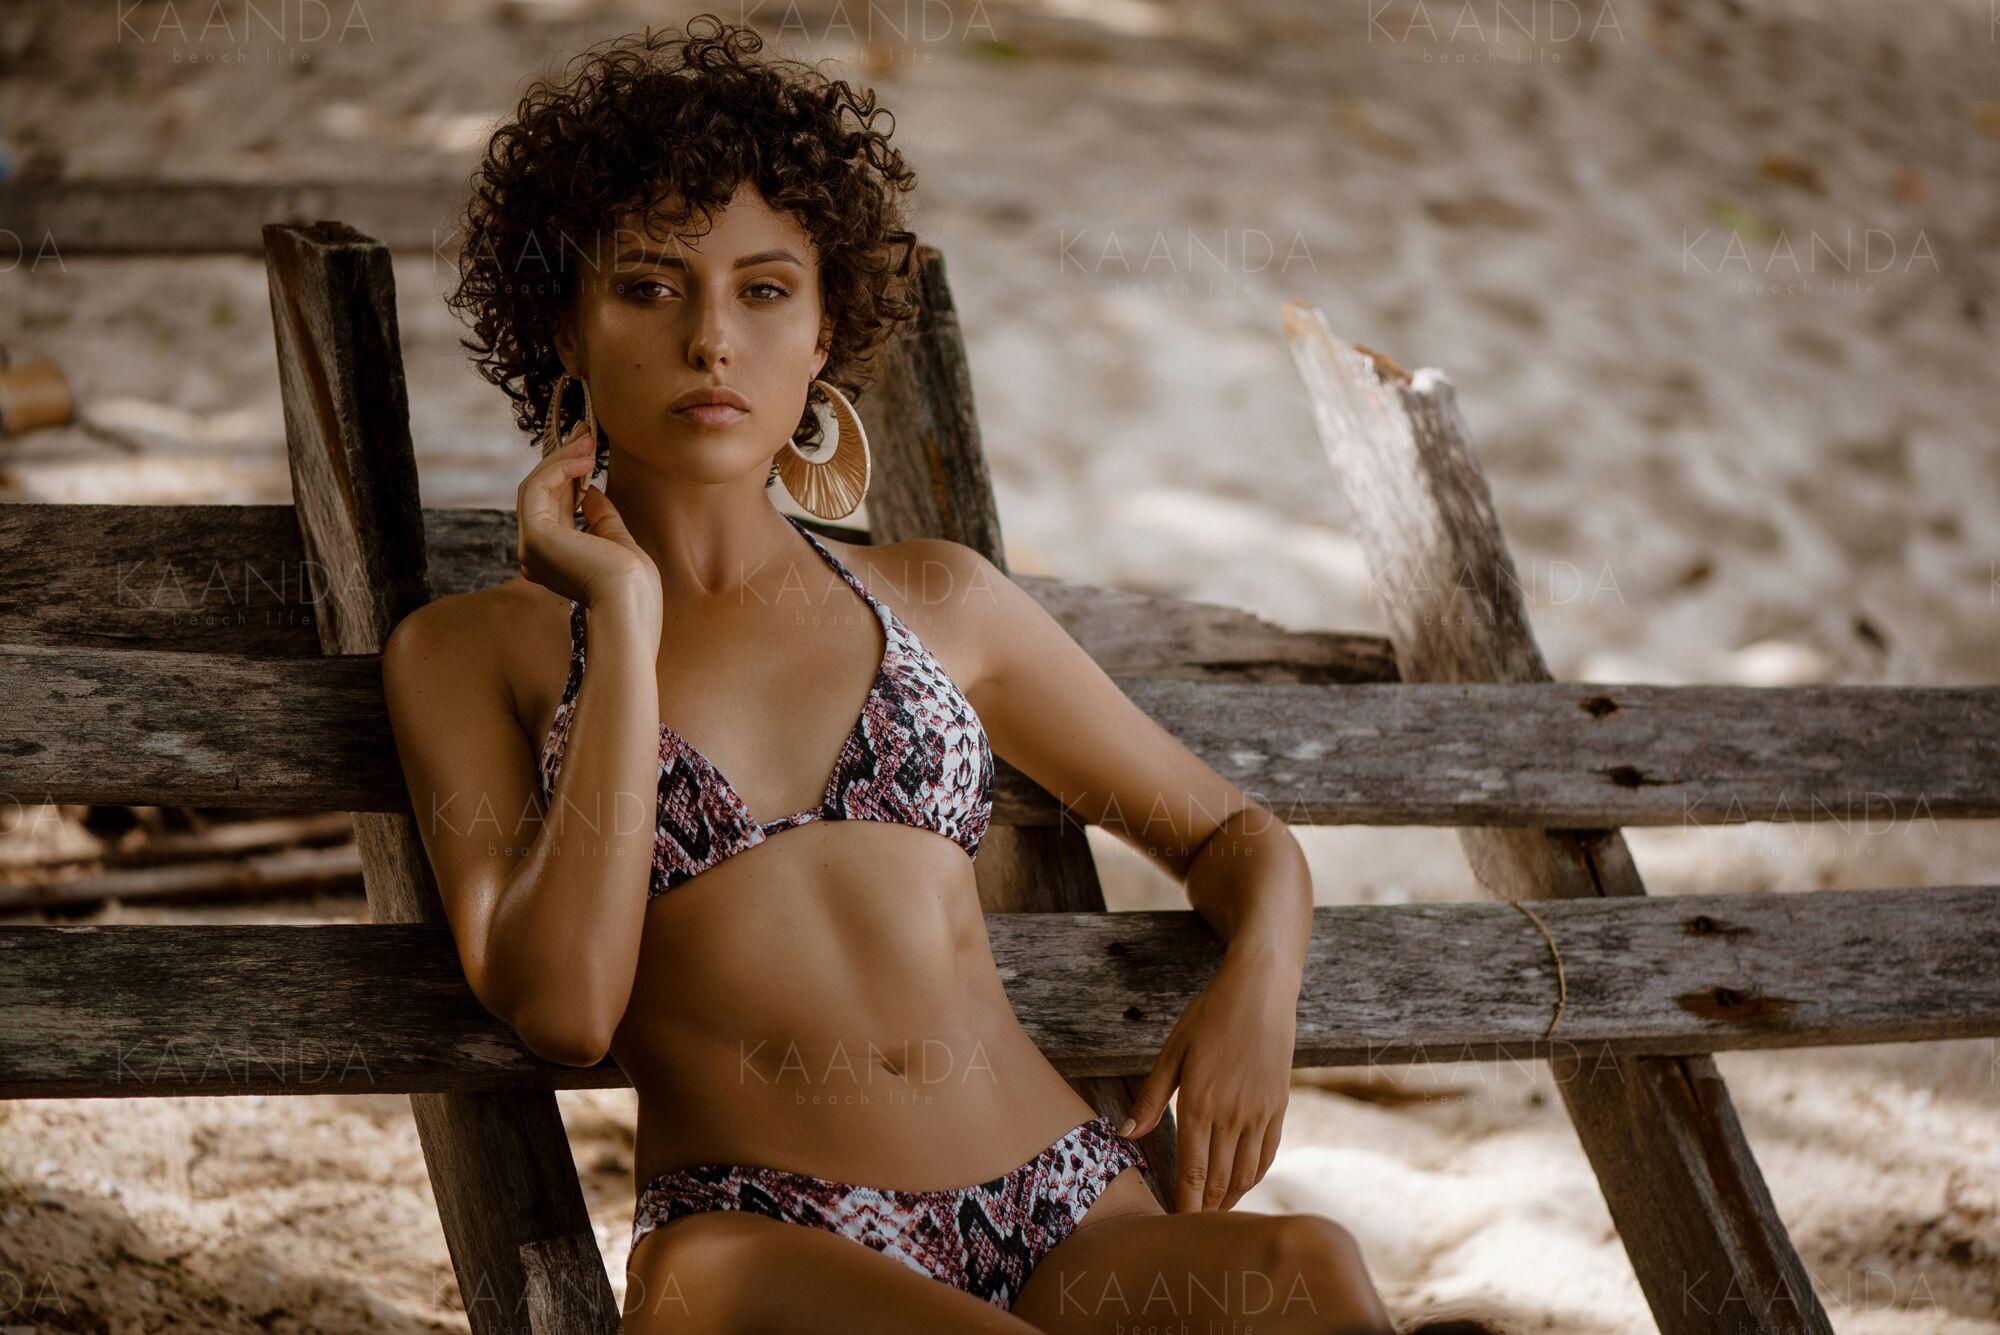 Bikinibyxa med knyt, Kaanda Beach,Stella Snake Surf